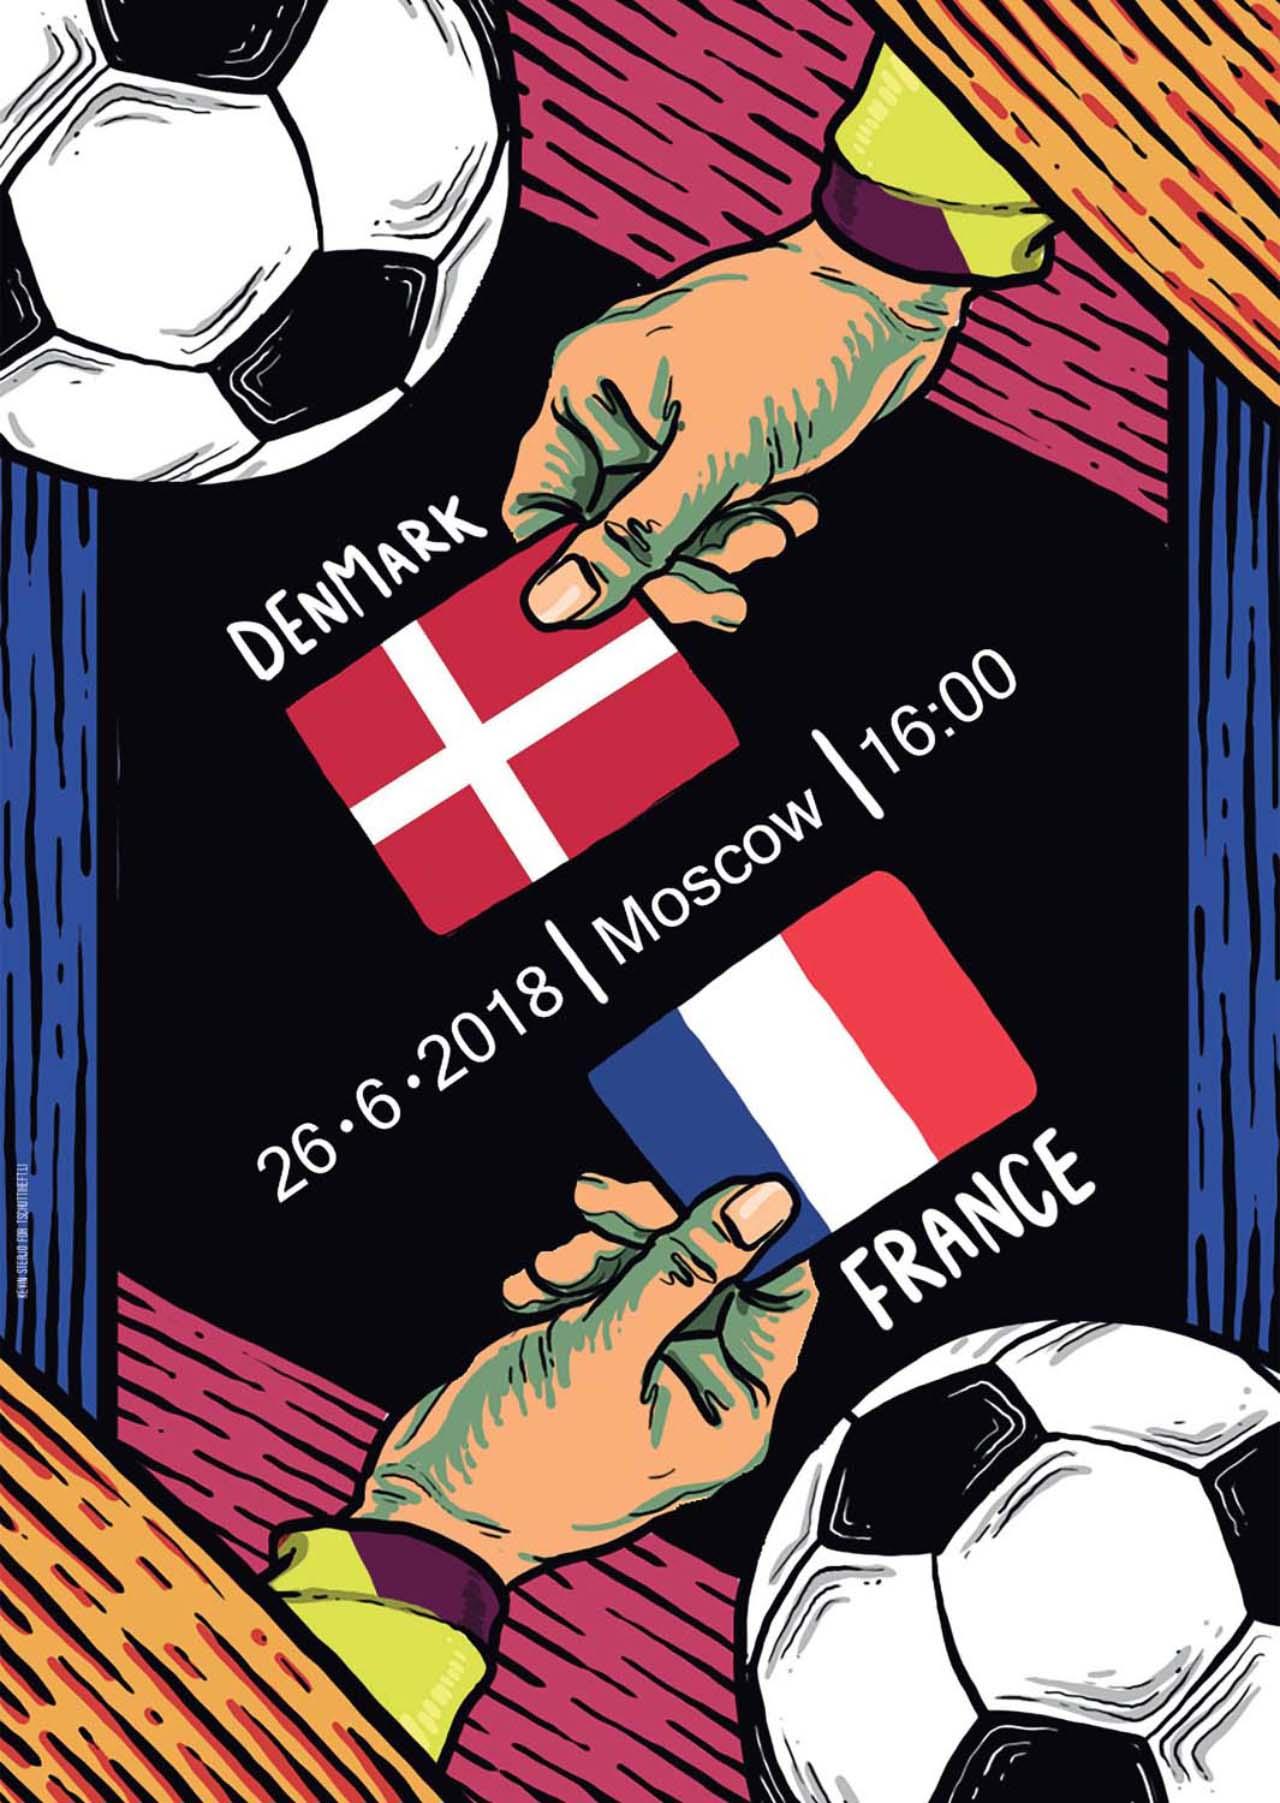 Tschutti Heftli Matchplakat Dänemark Frankreich